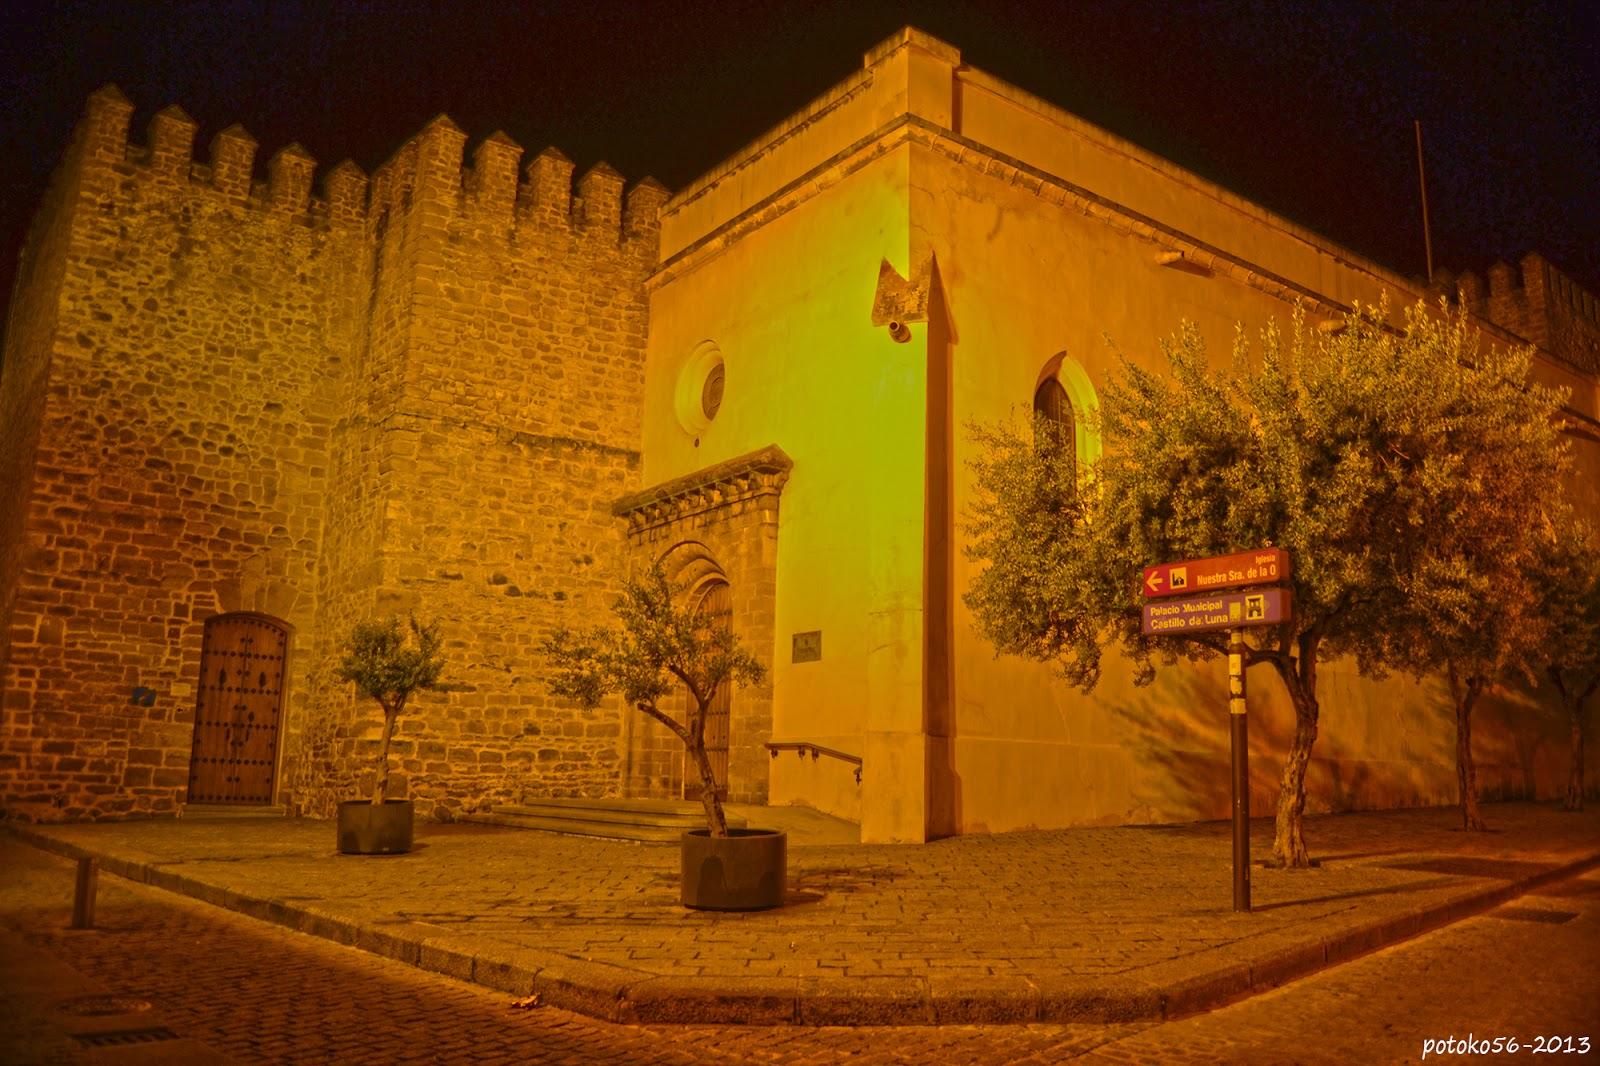 Una entrada al Castillo de Luna Rota